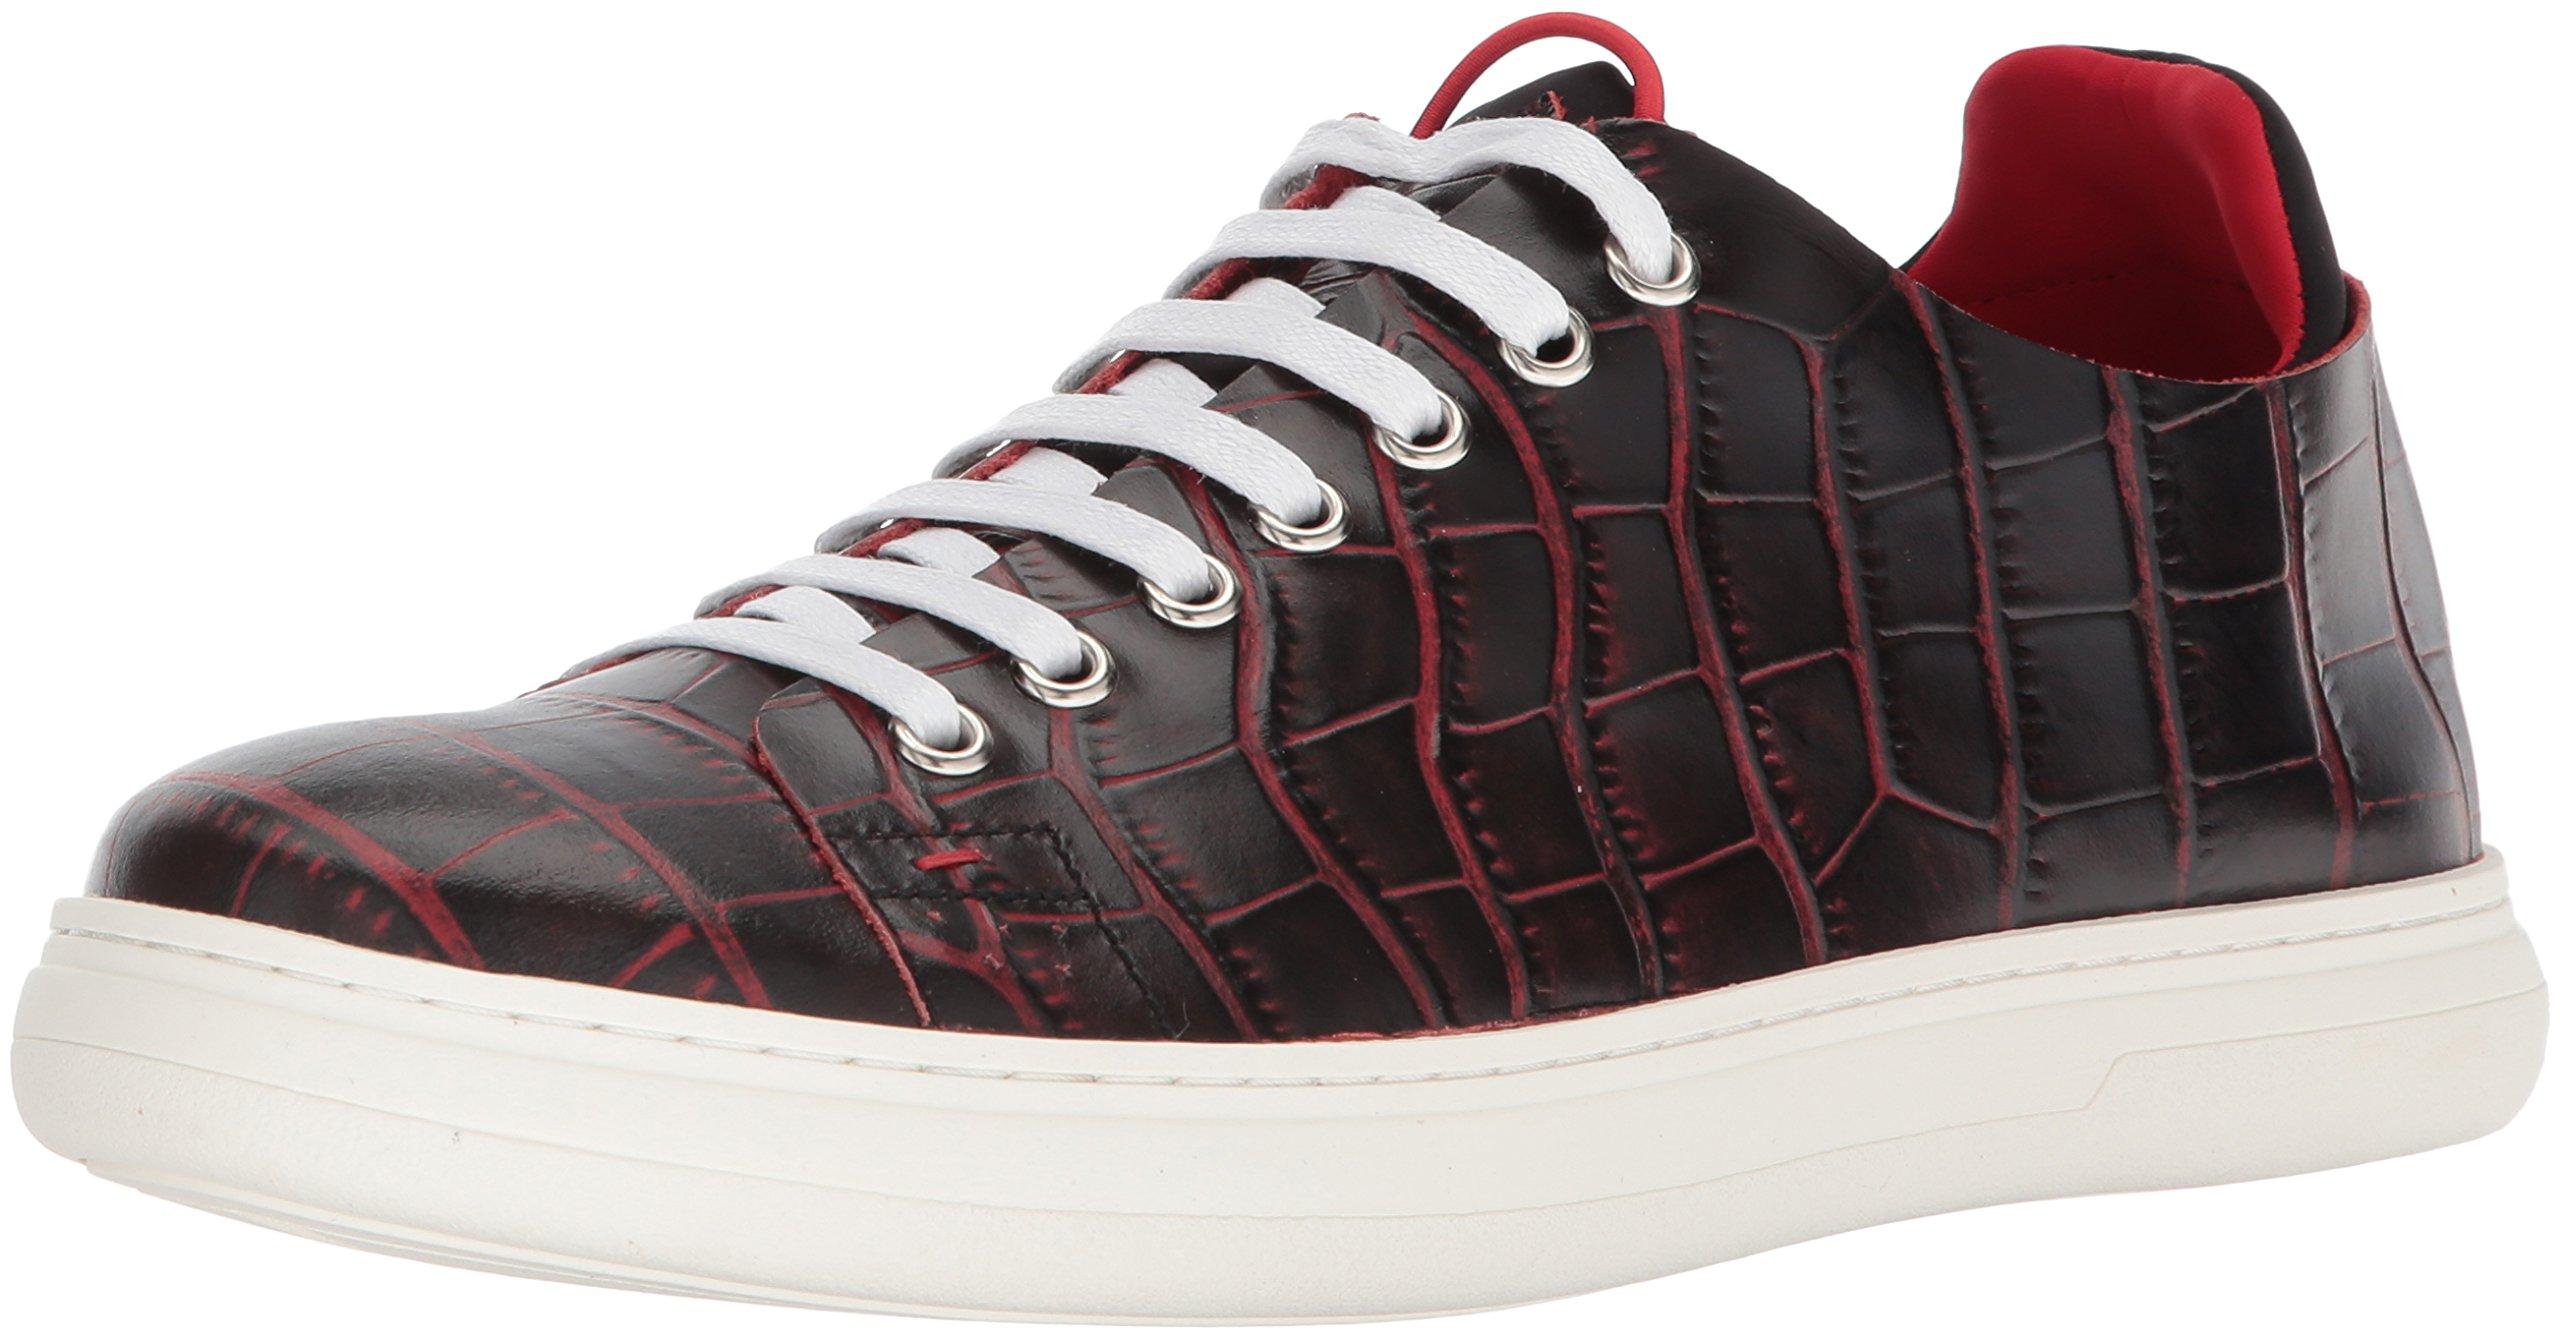 Donald J Pliner Men's Pierce Sneaker, Black, 12 Medium US